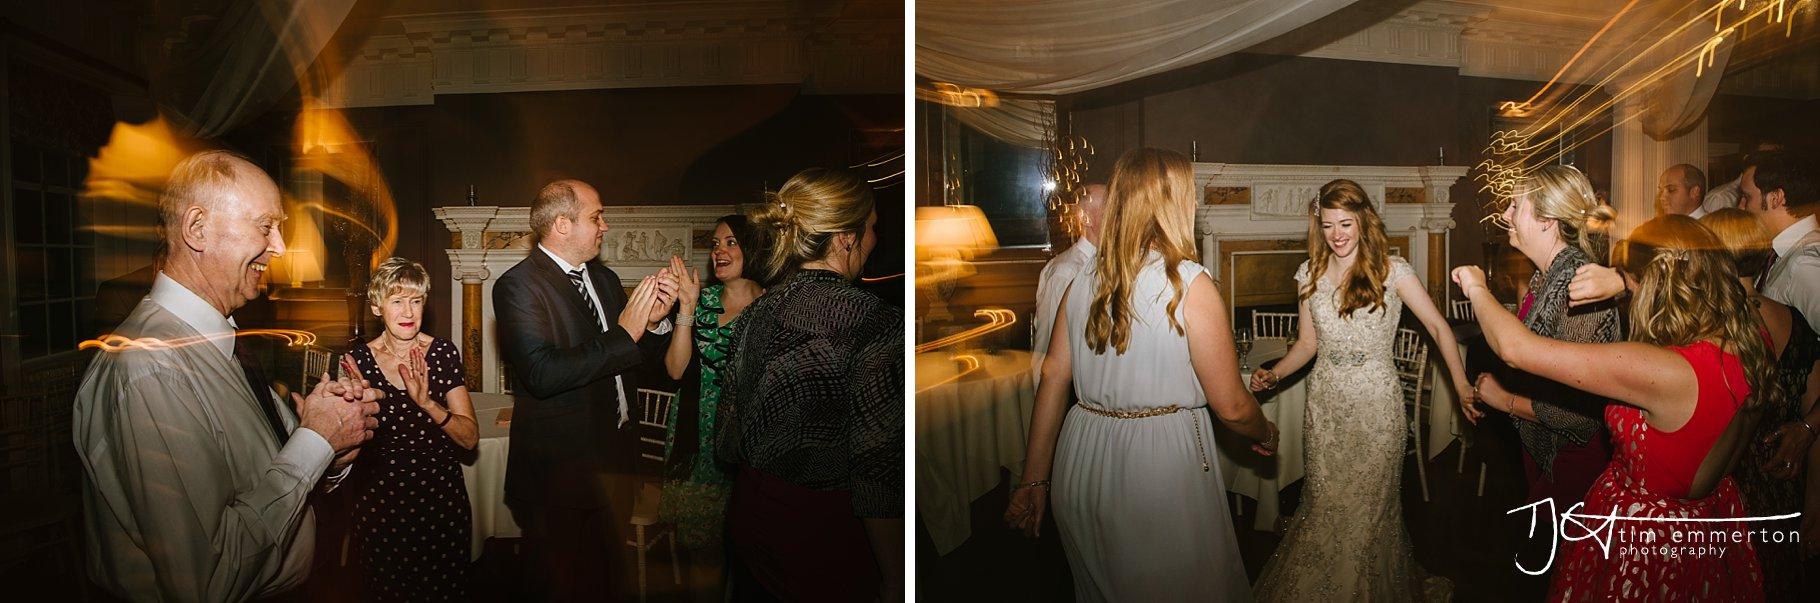 Eaves-Hall-Wedding-Photographer-152.jpg